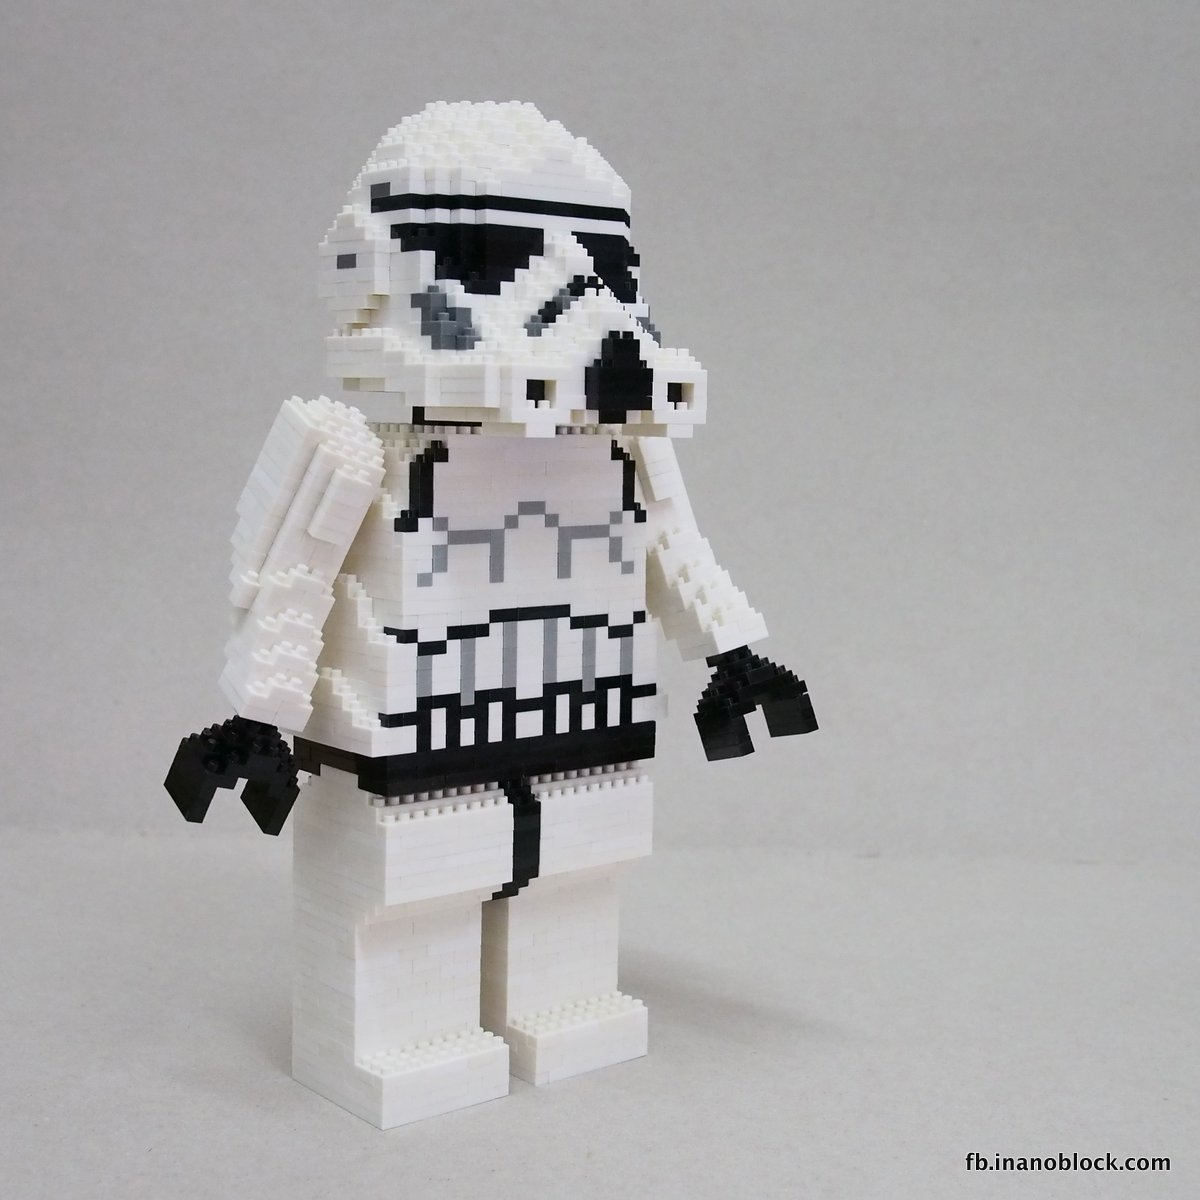 Christopher Tan Nanoblock Star Wars Stormtrooper Build Instructions